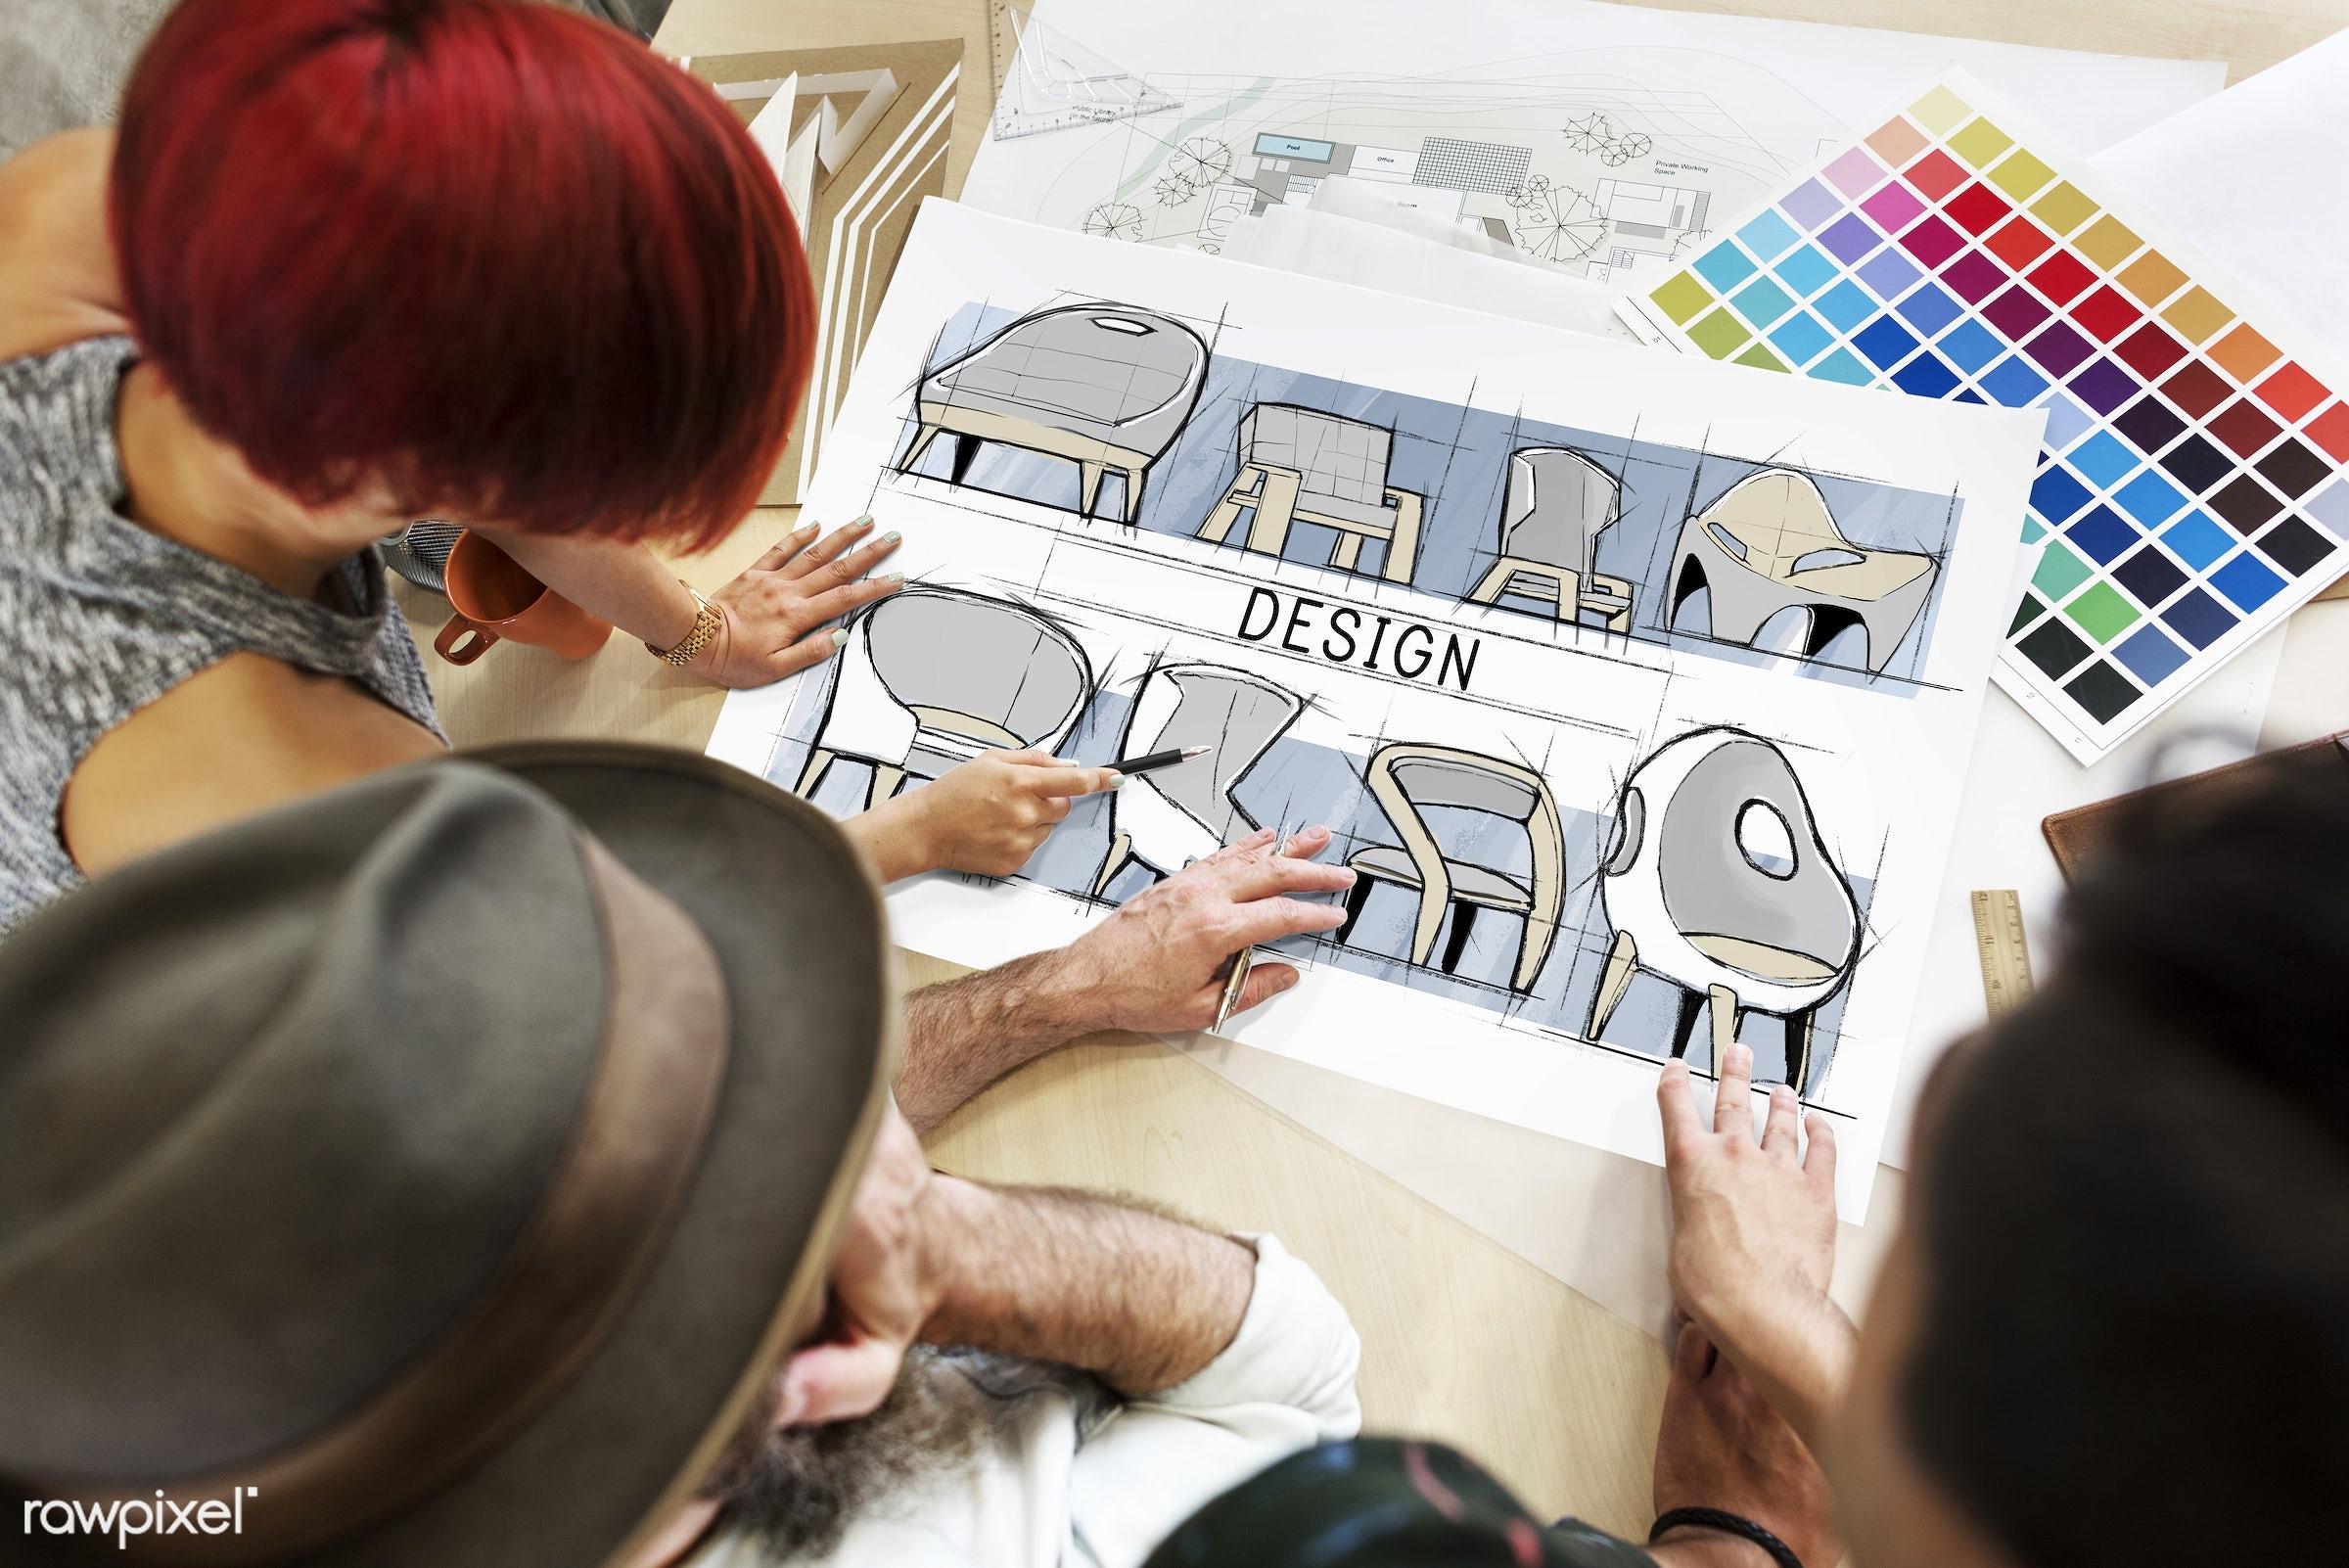 Architects working in a design studio - sketch, designer, interior, development, maintenance, think, thinking, art, color...